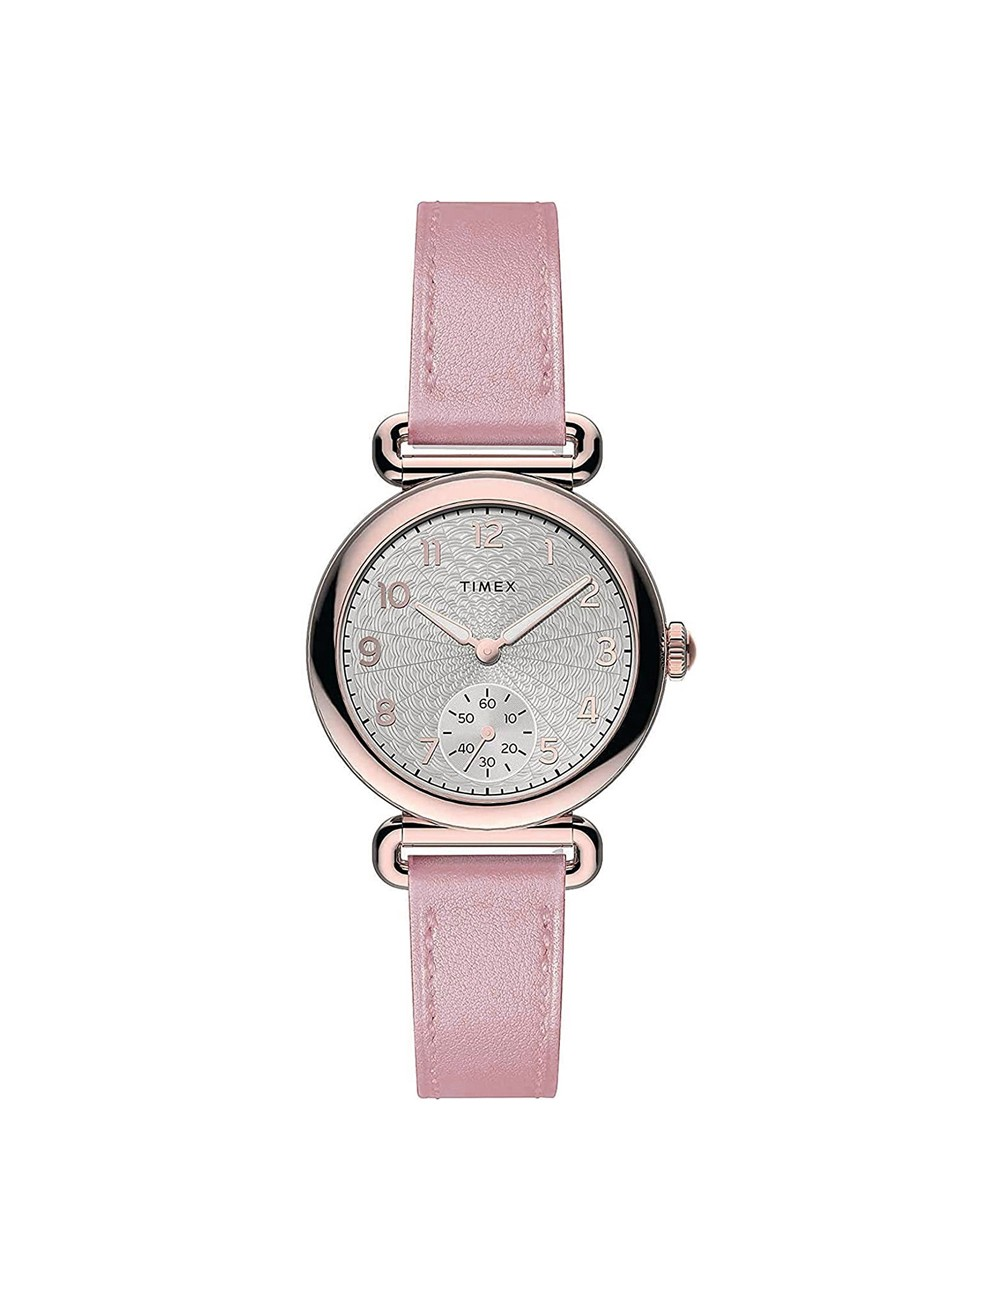 Timex Model 23 TW2T88400 Ladies Watch